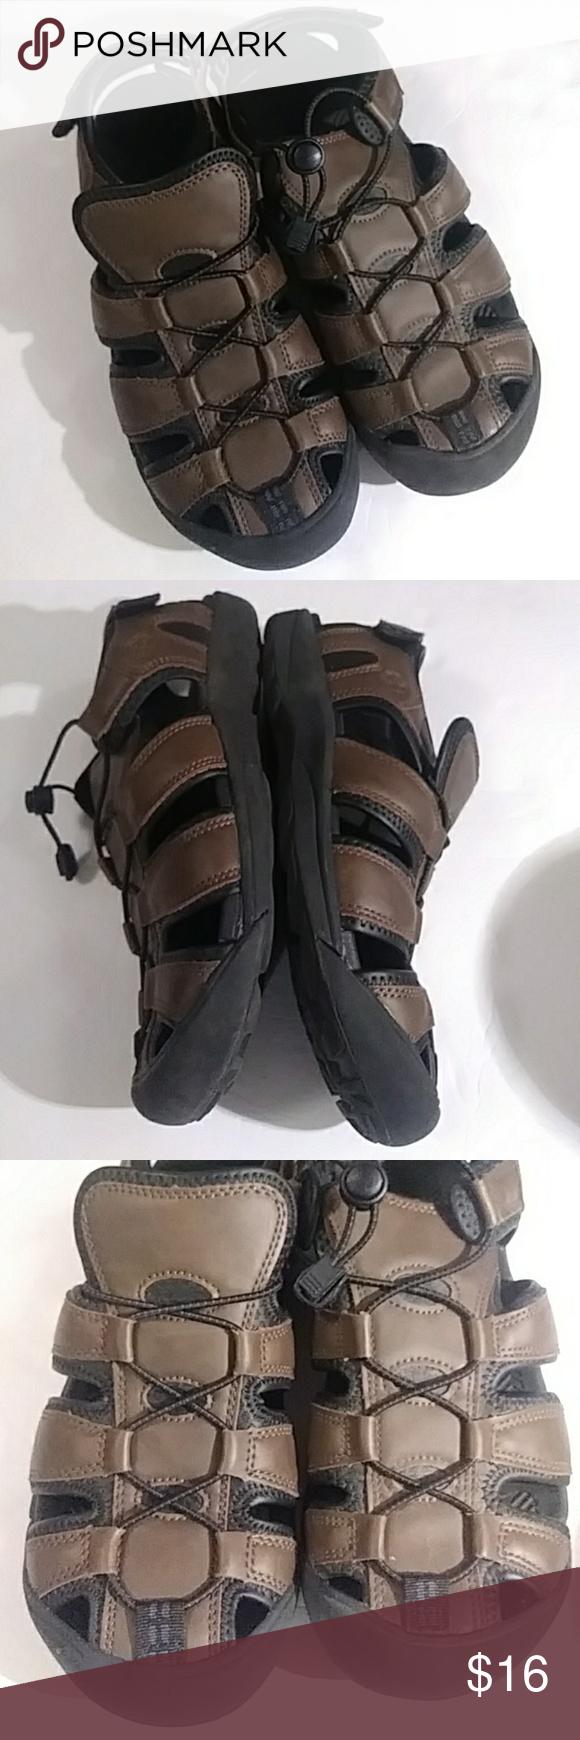 94a70d34f511 Khumbo Men s Travis Sandals Brown Shoes 8 Khumbo Men s Travis Sandals Brown  Shoes 8 Great condition No tags or box Khombu Shoes Sandals   Flip-Flops